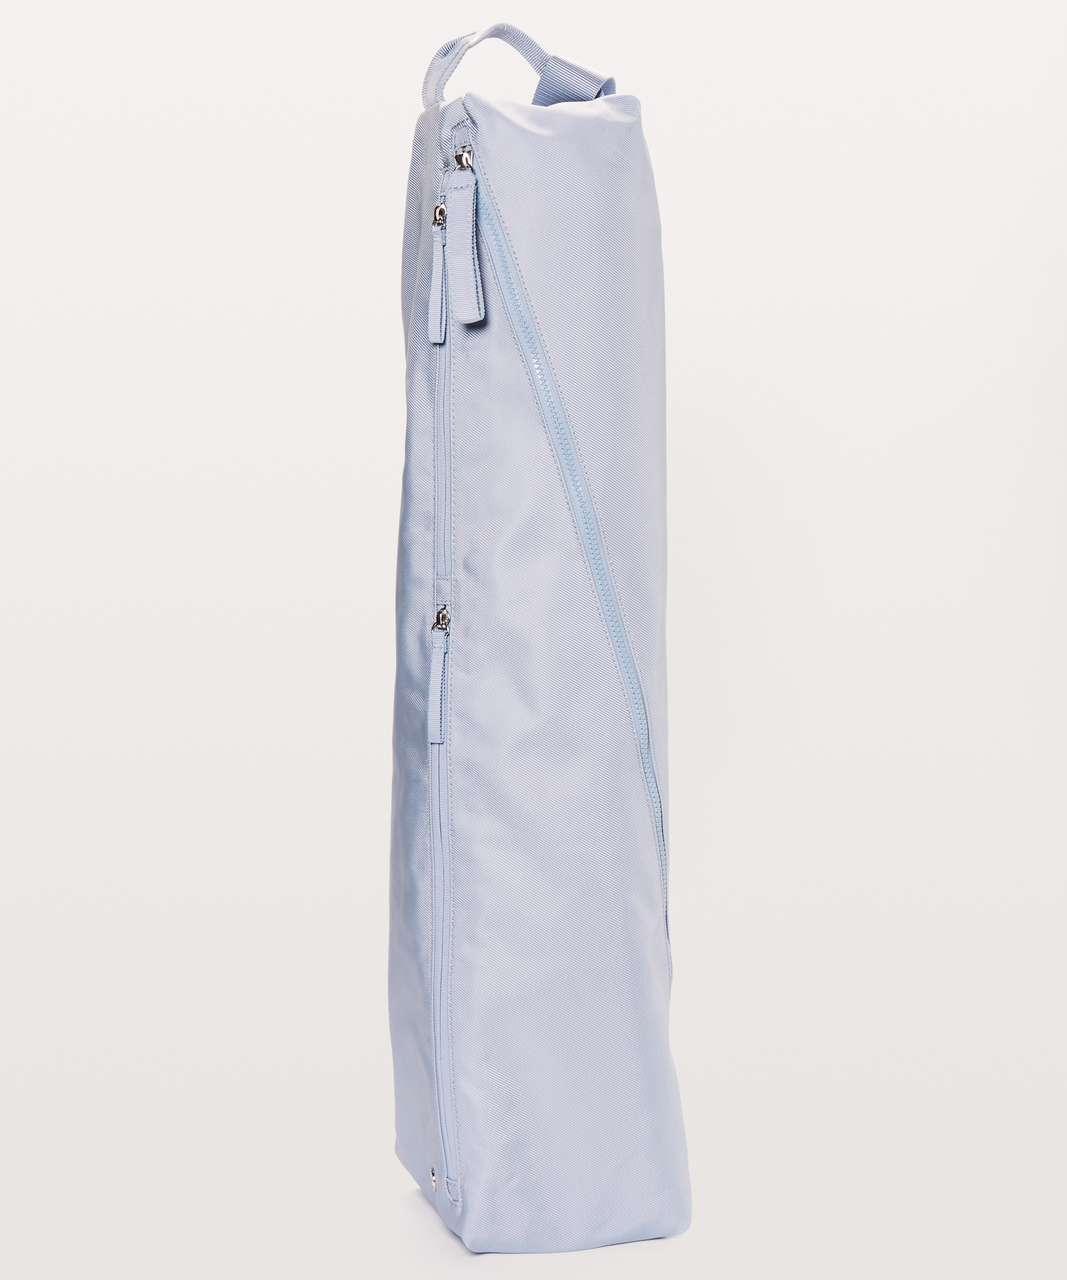 Lululemon The Yoga Bag *14L - Berry Mist